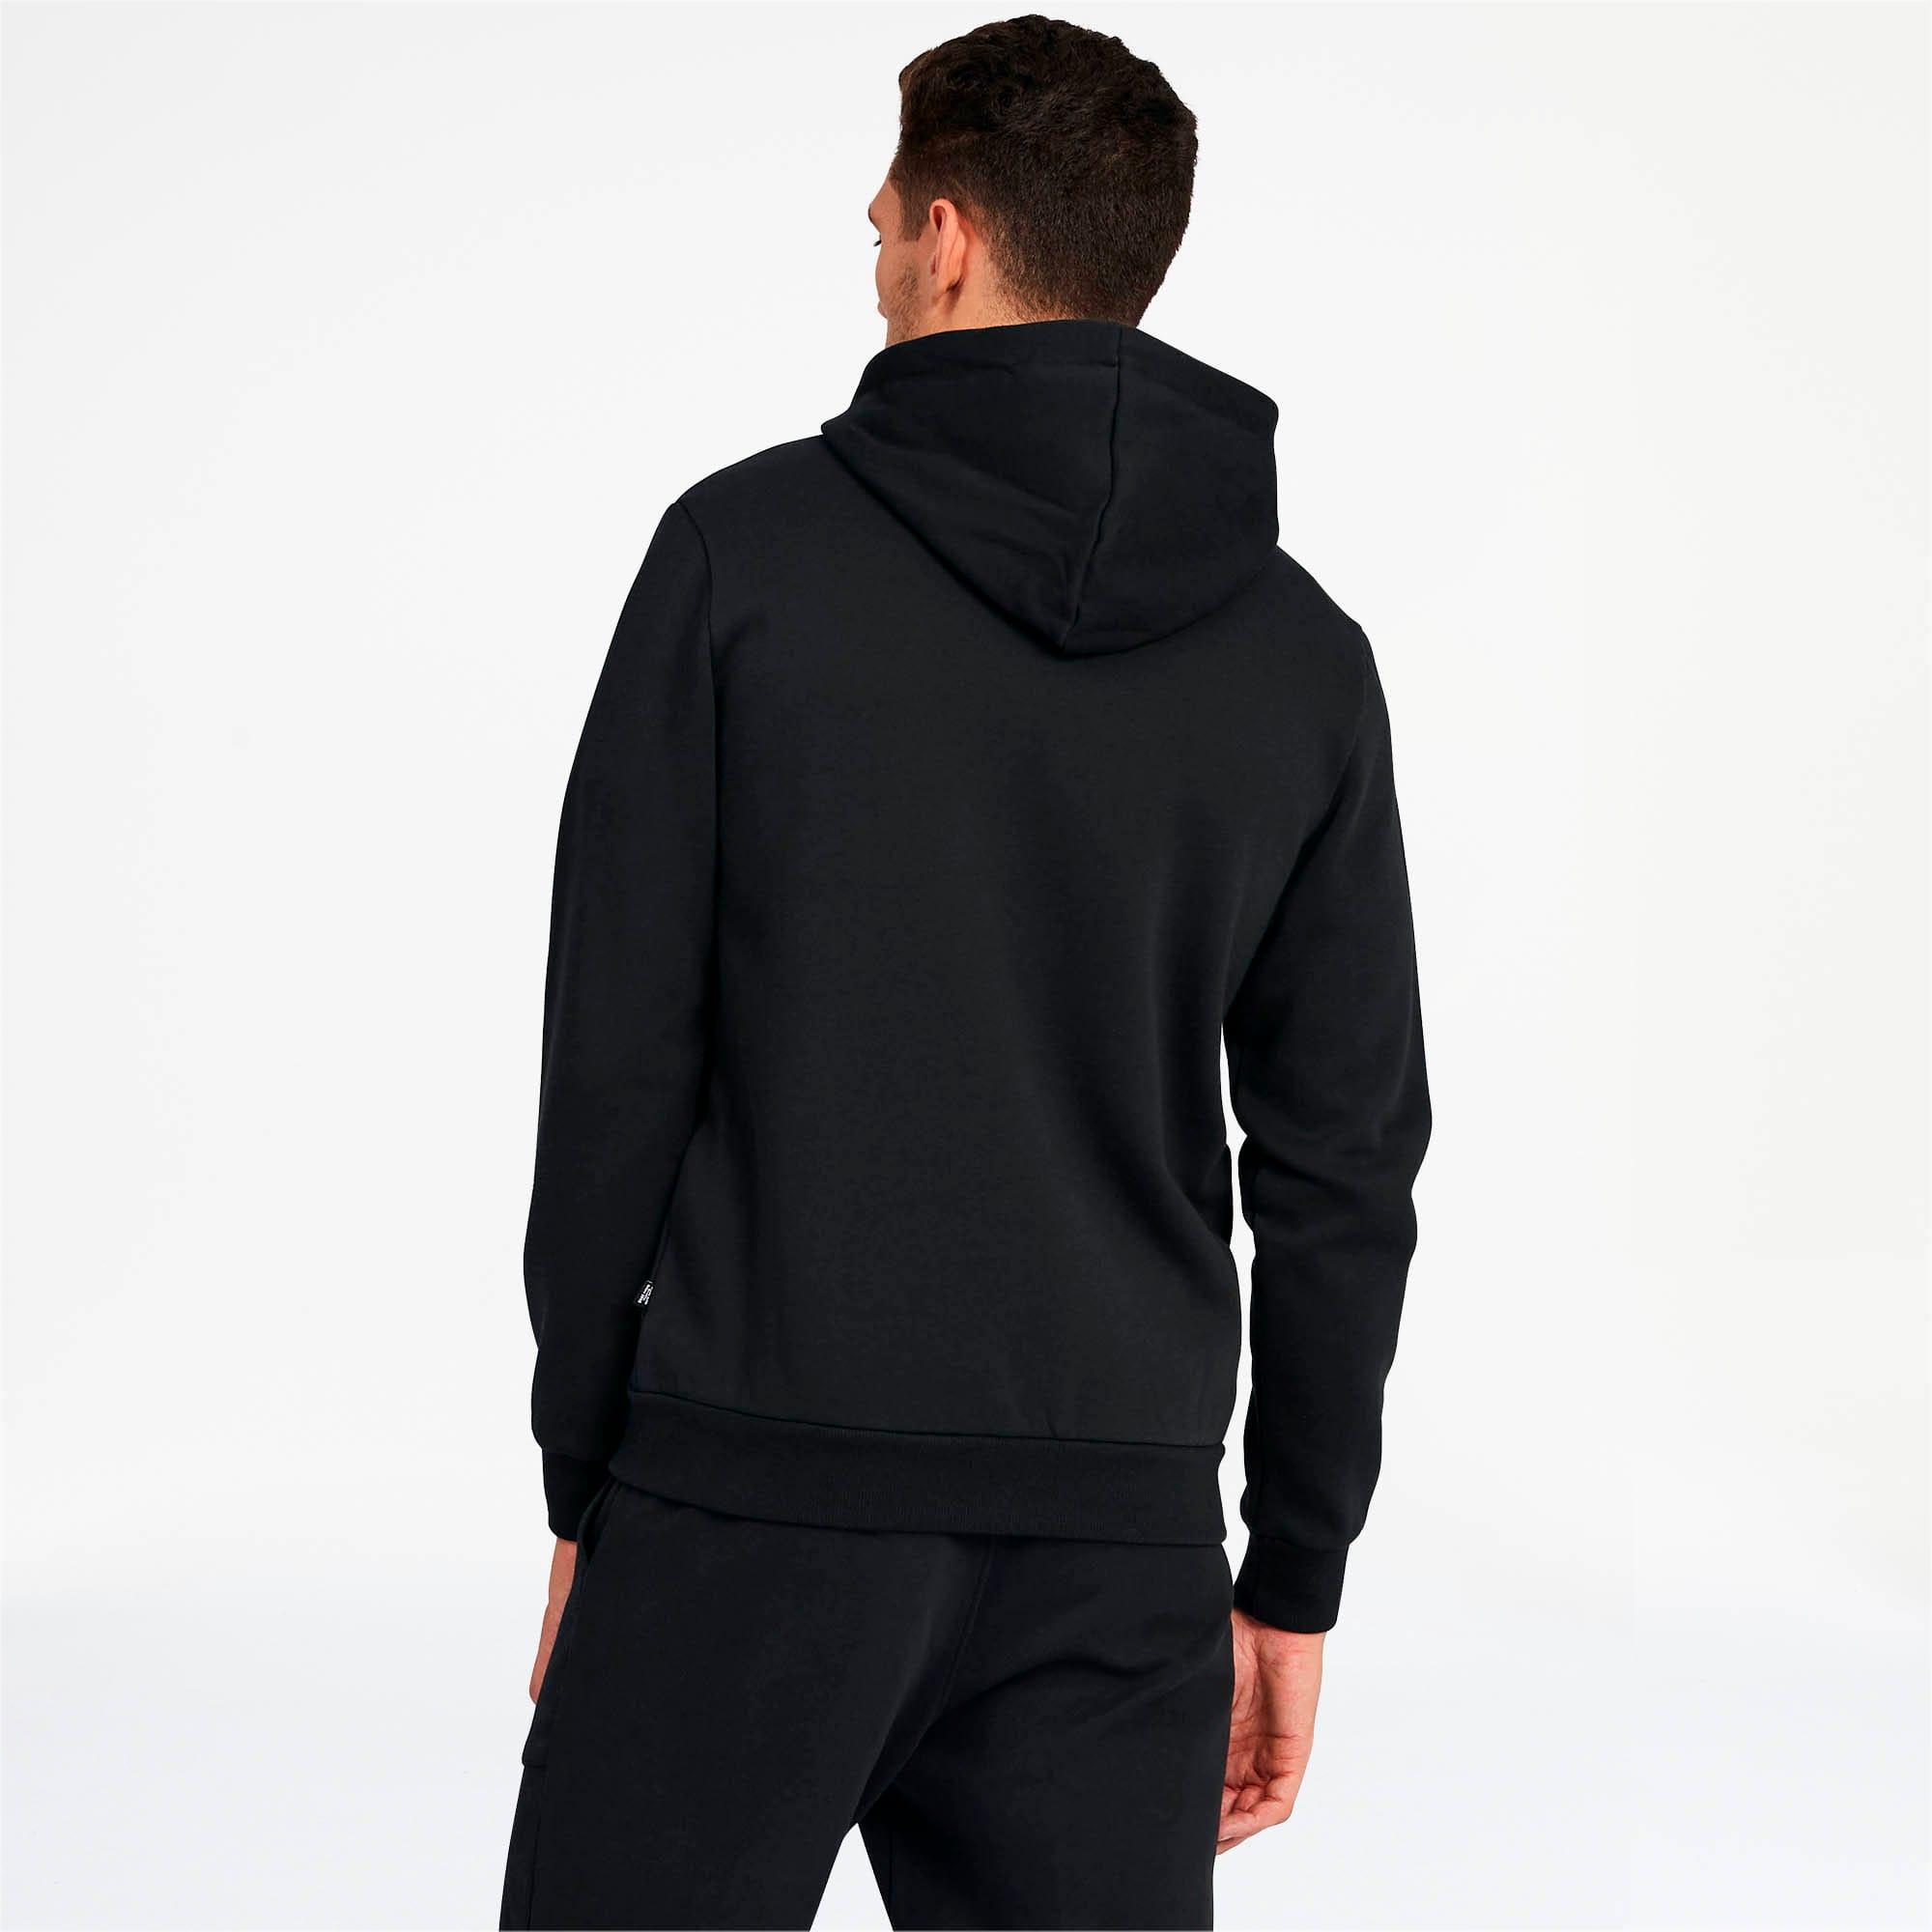 Thumbnail 2 of Essentials Men's Hooded Fleece Jacket, Puma Black, medium